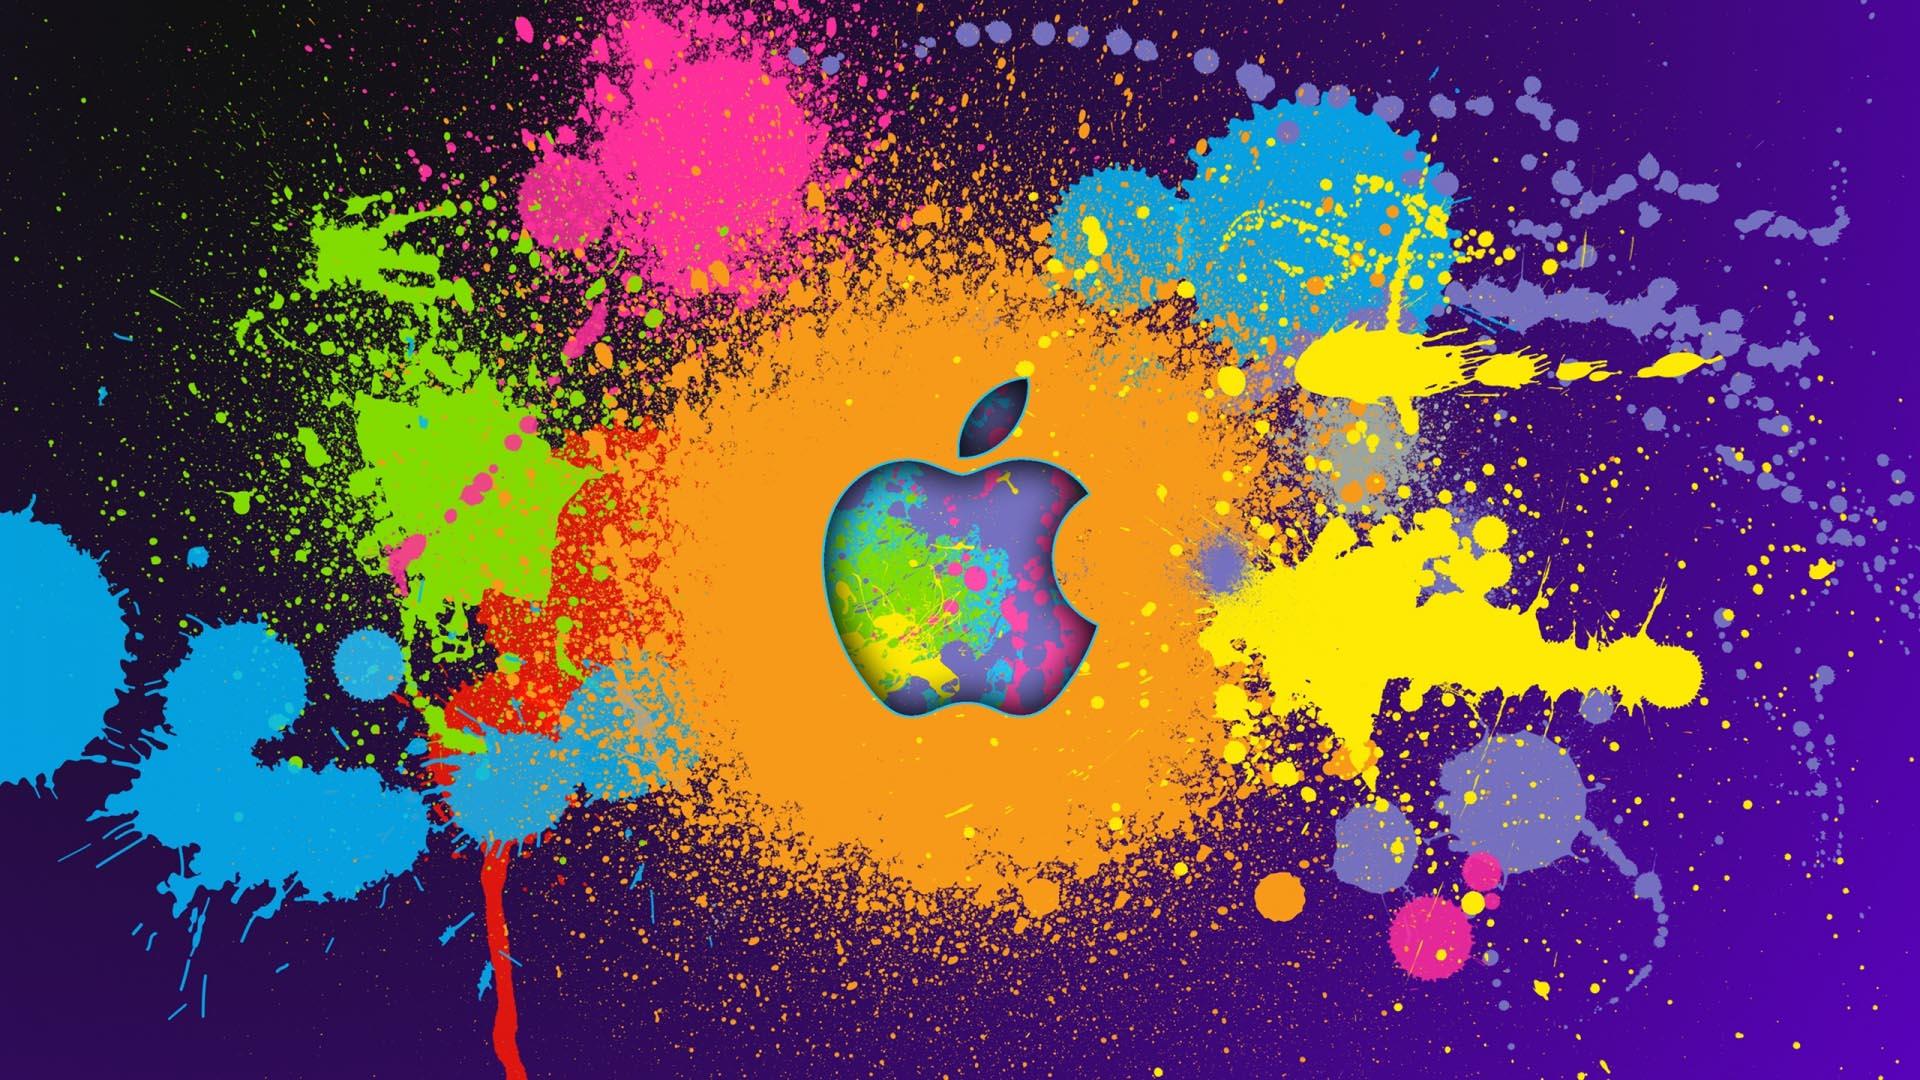 cool apple wallpaper | 1920x1080 | #77919